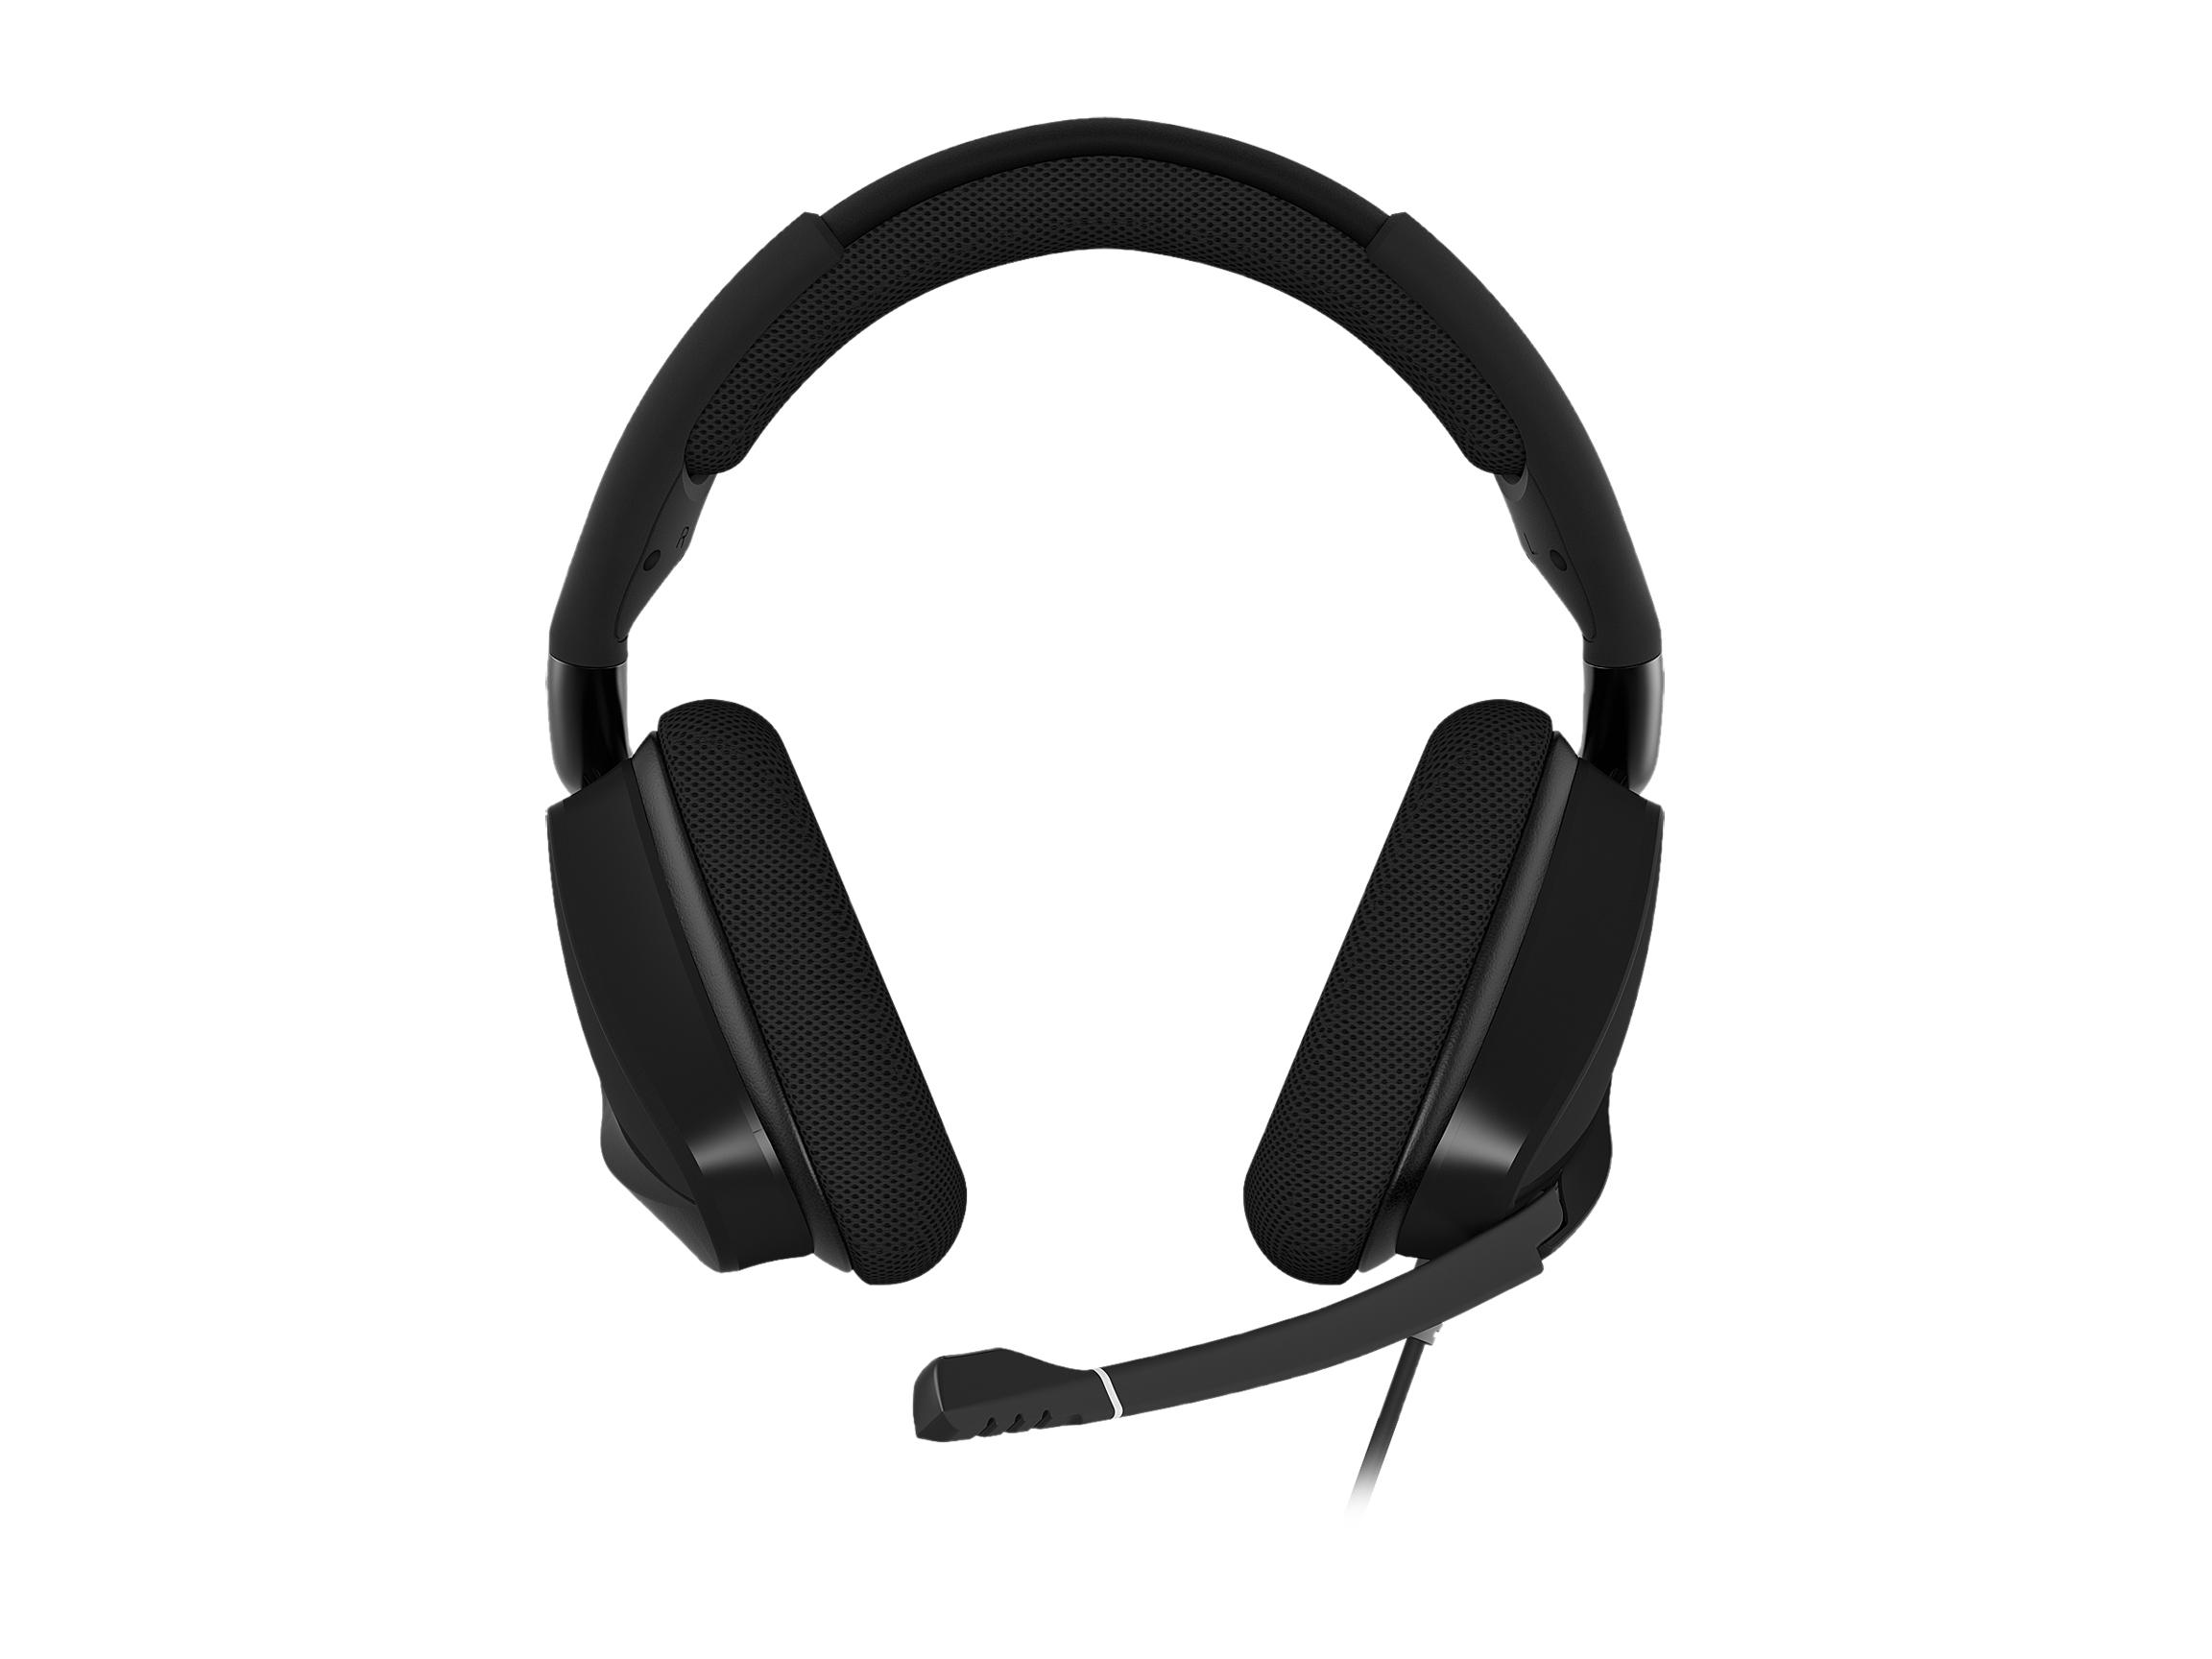 Corsair VOID RGB ELITE USB Connector Circumaural Premium Gaming Headset with 7.1 Surround Sound - Carbon